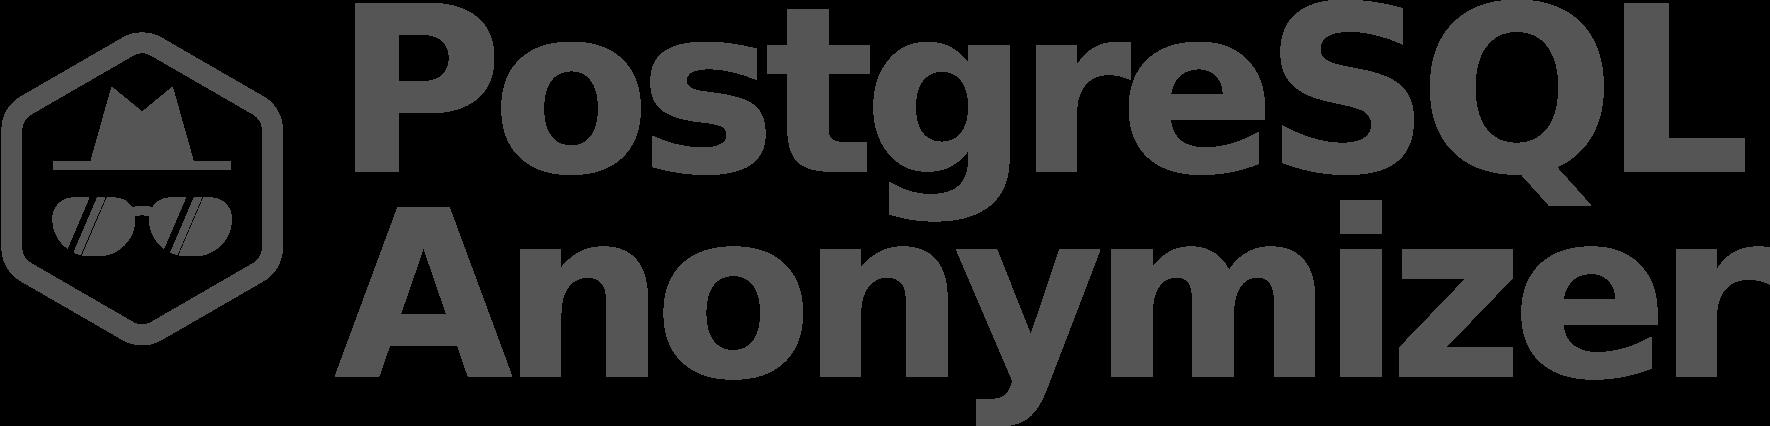 PostgreSQL Anonymizer